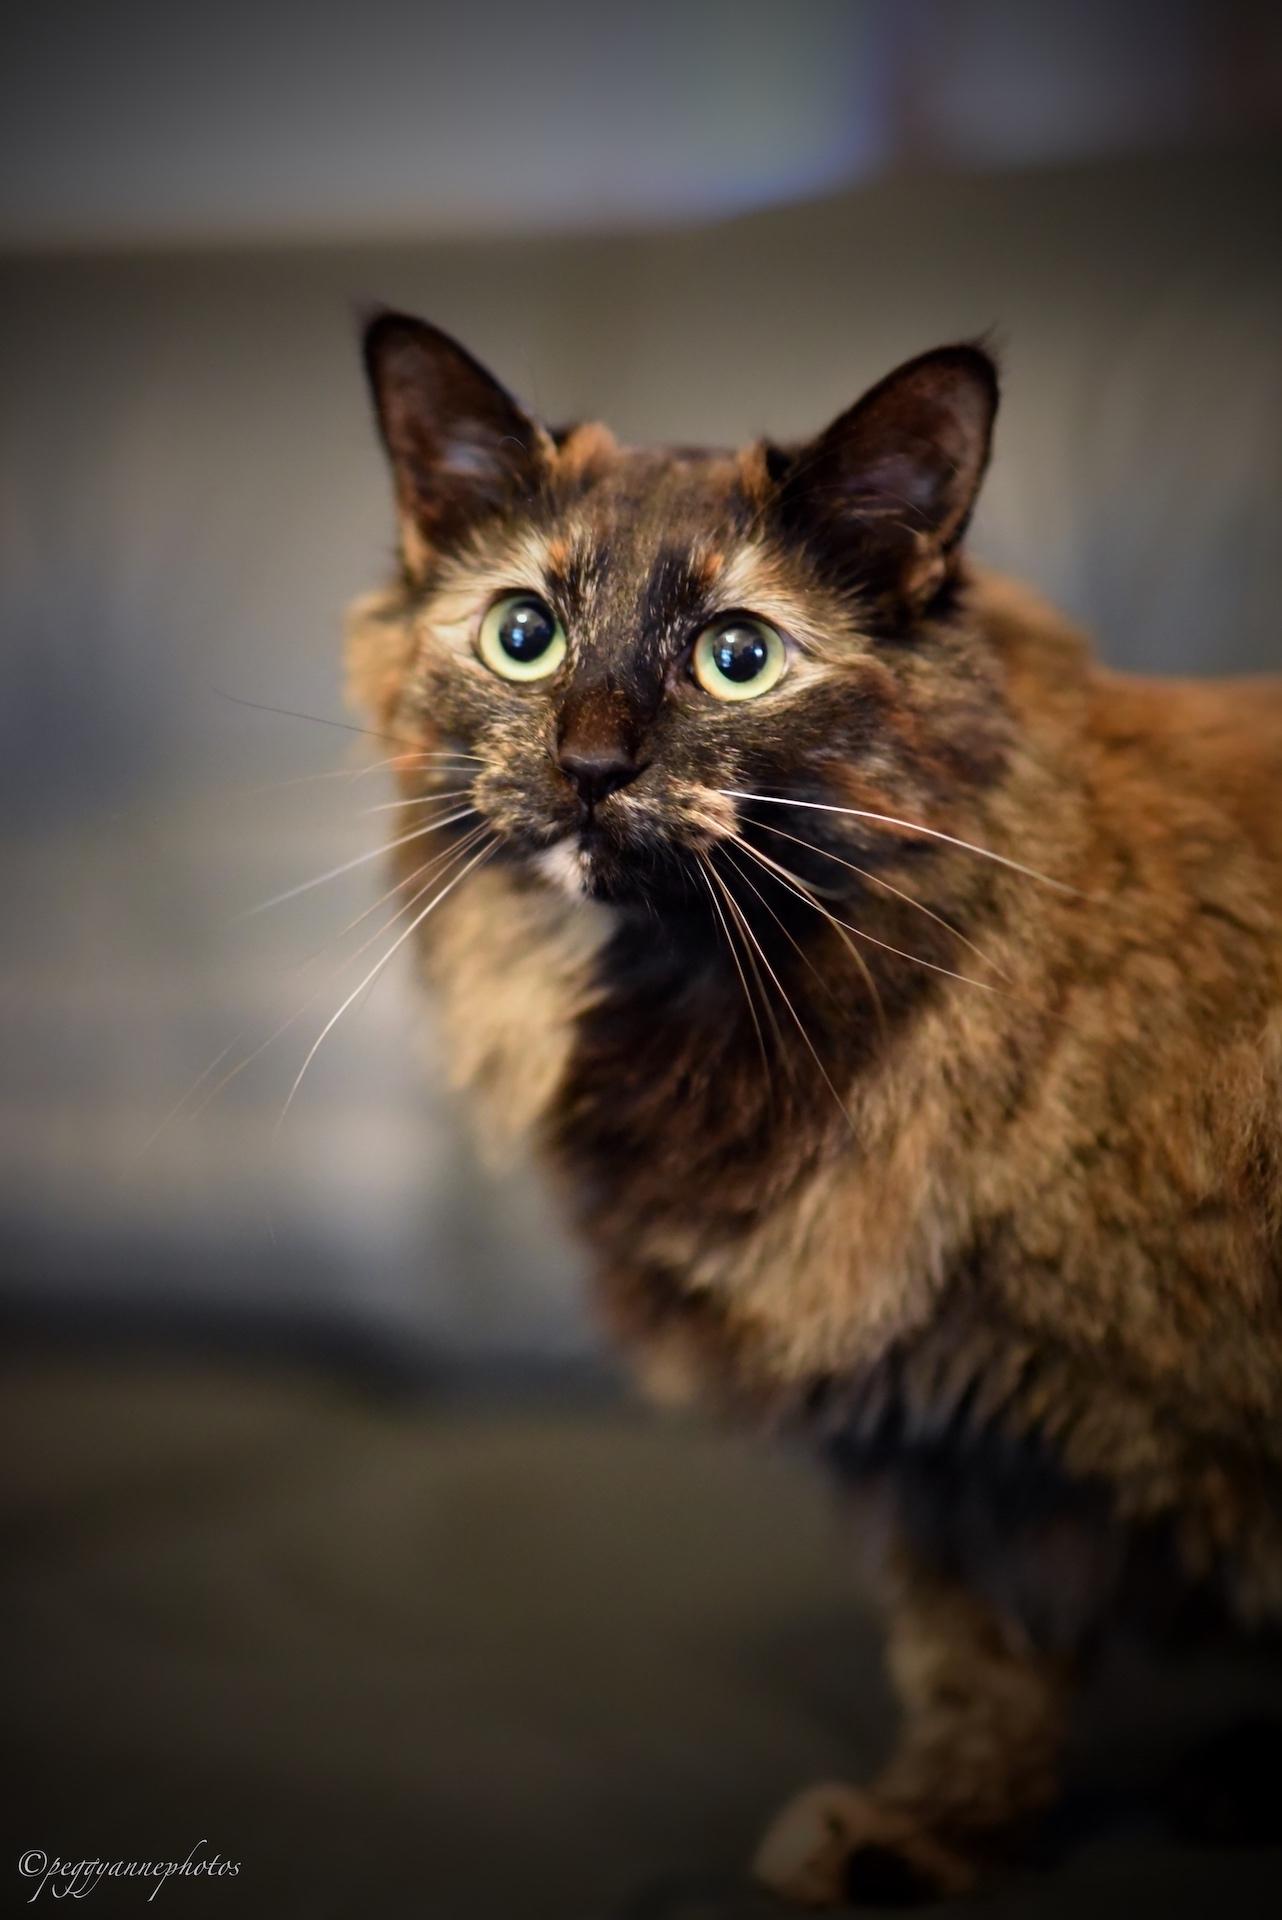 2019_05_14 Shaneys cats PCSmall03.JPG